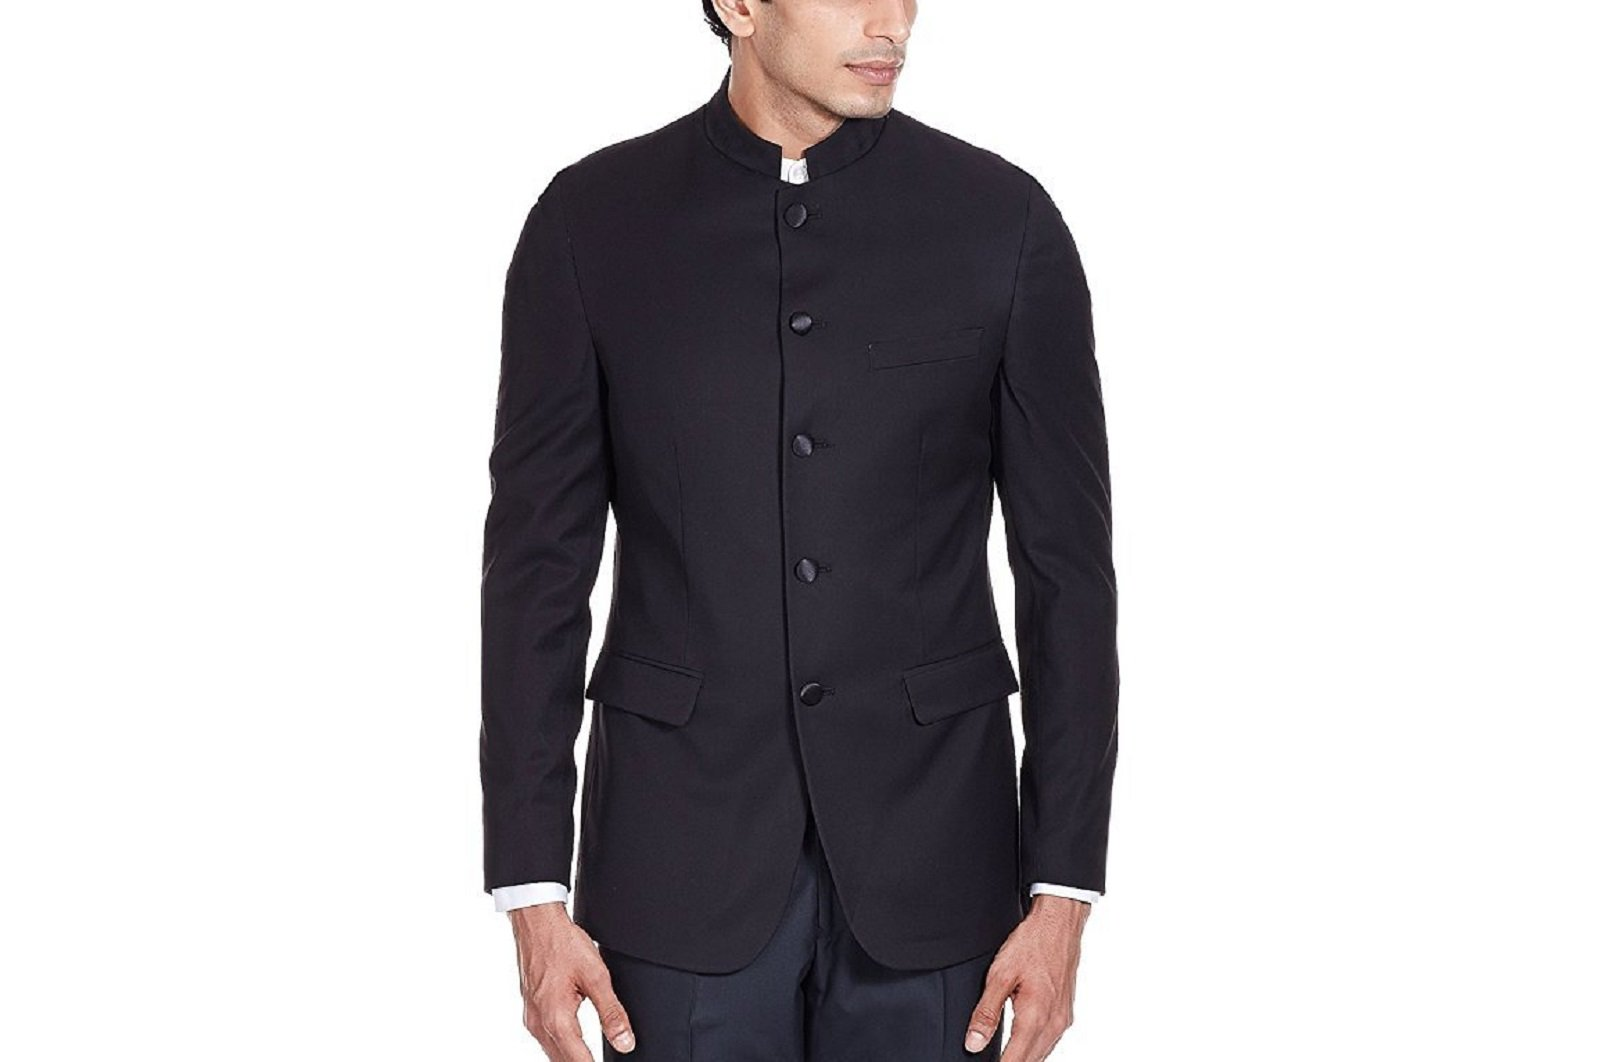 Royal Men's Black Polyviscose Granddad Collar Business Jacket (36, Black)